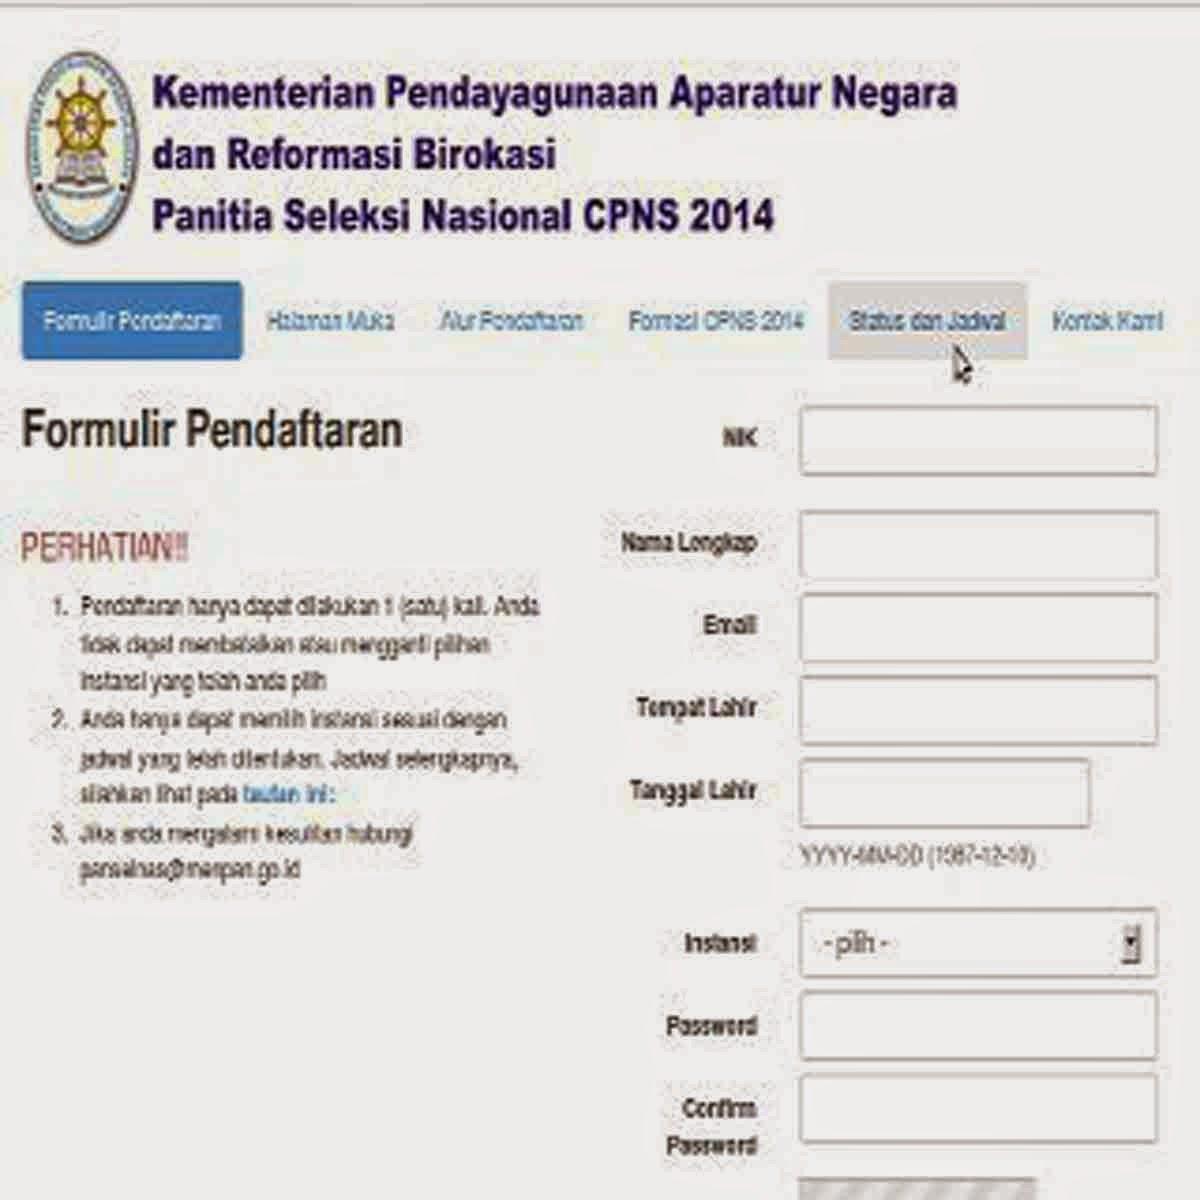 Soal Cpns 2014 Pdf Gratis